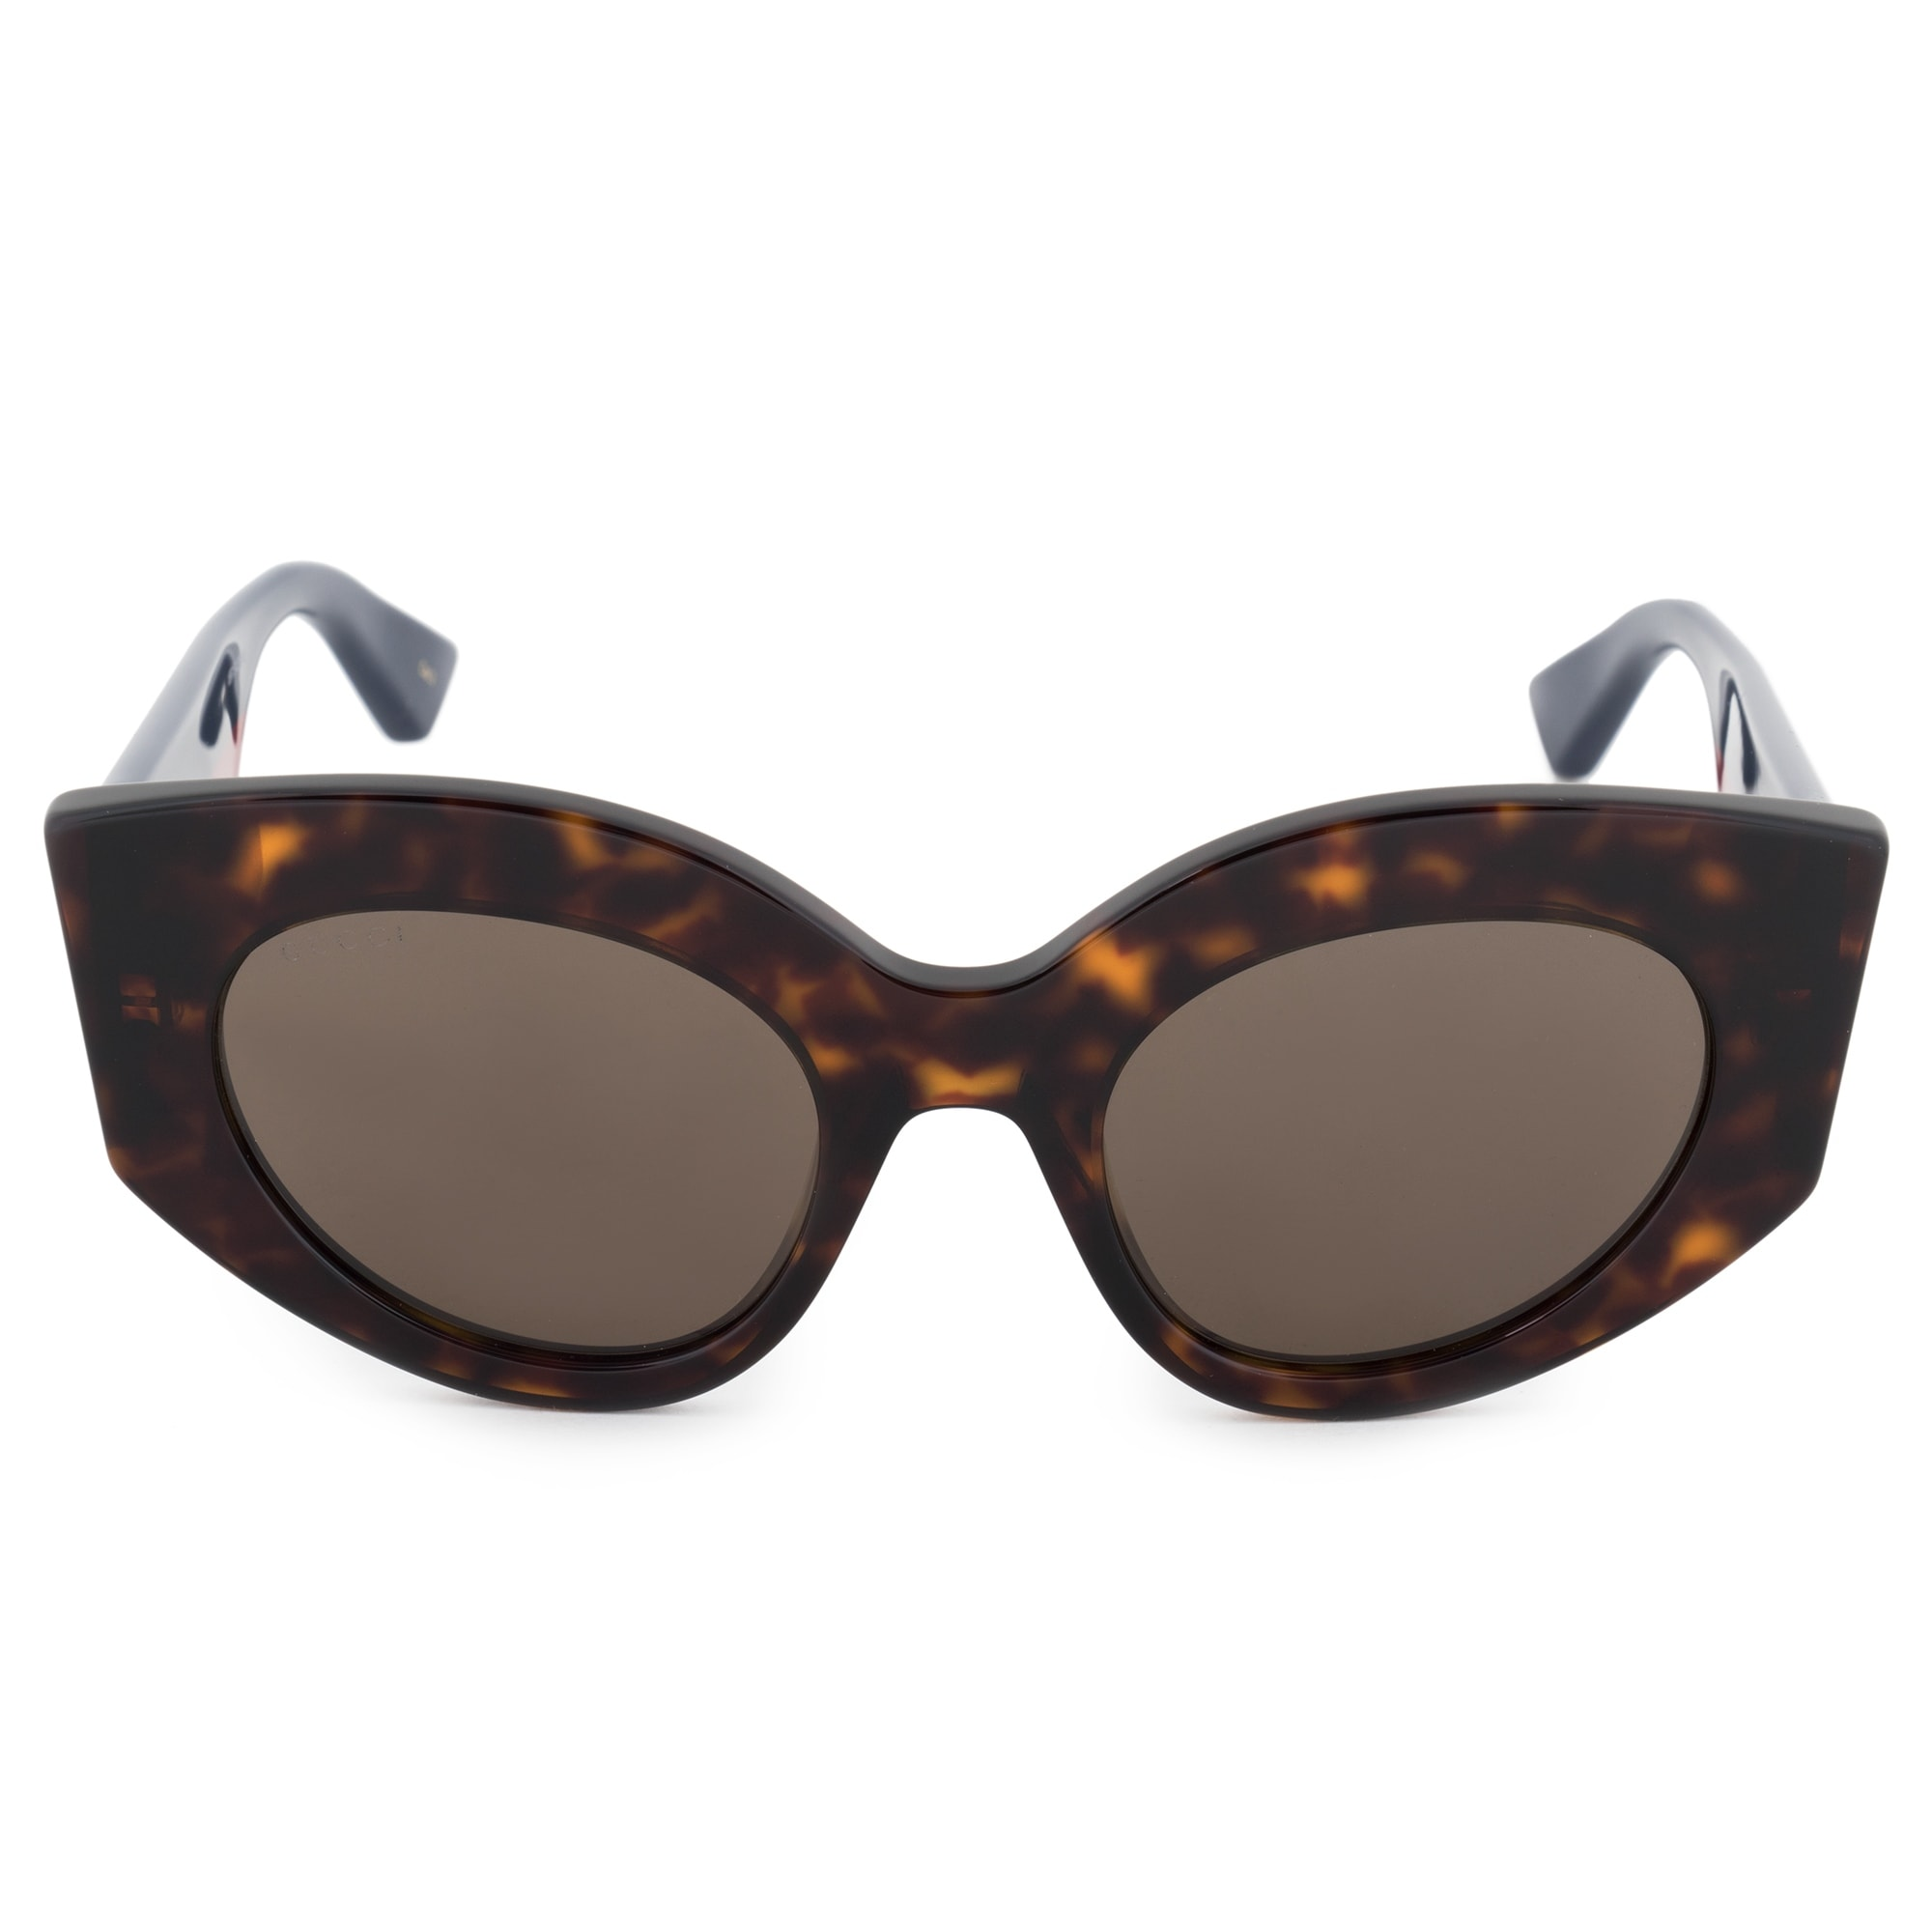 b88d557bb2ff0 Shop Gucci Gucci Cat Eye Sunglasses GG0275S 002 52 - Free Shipping ...